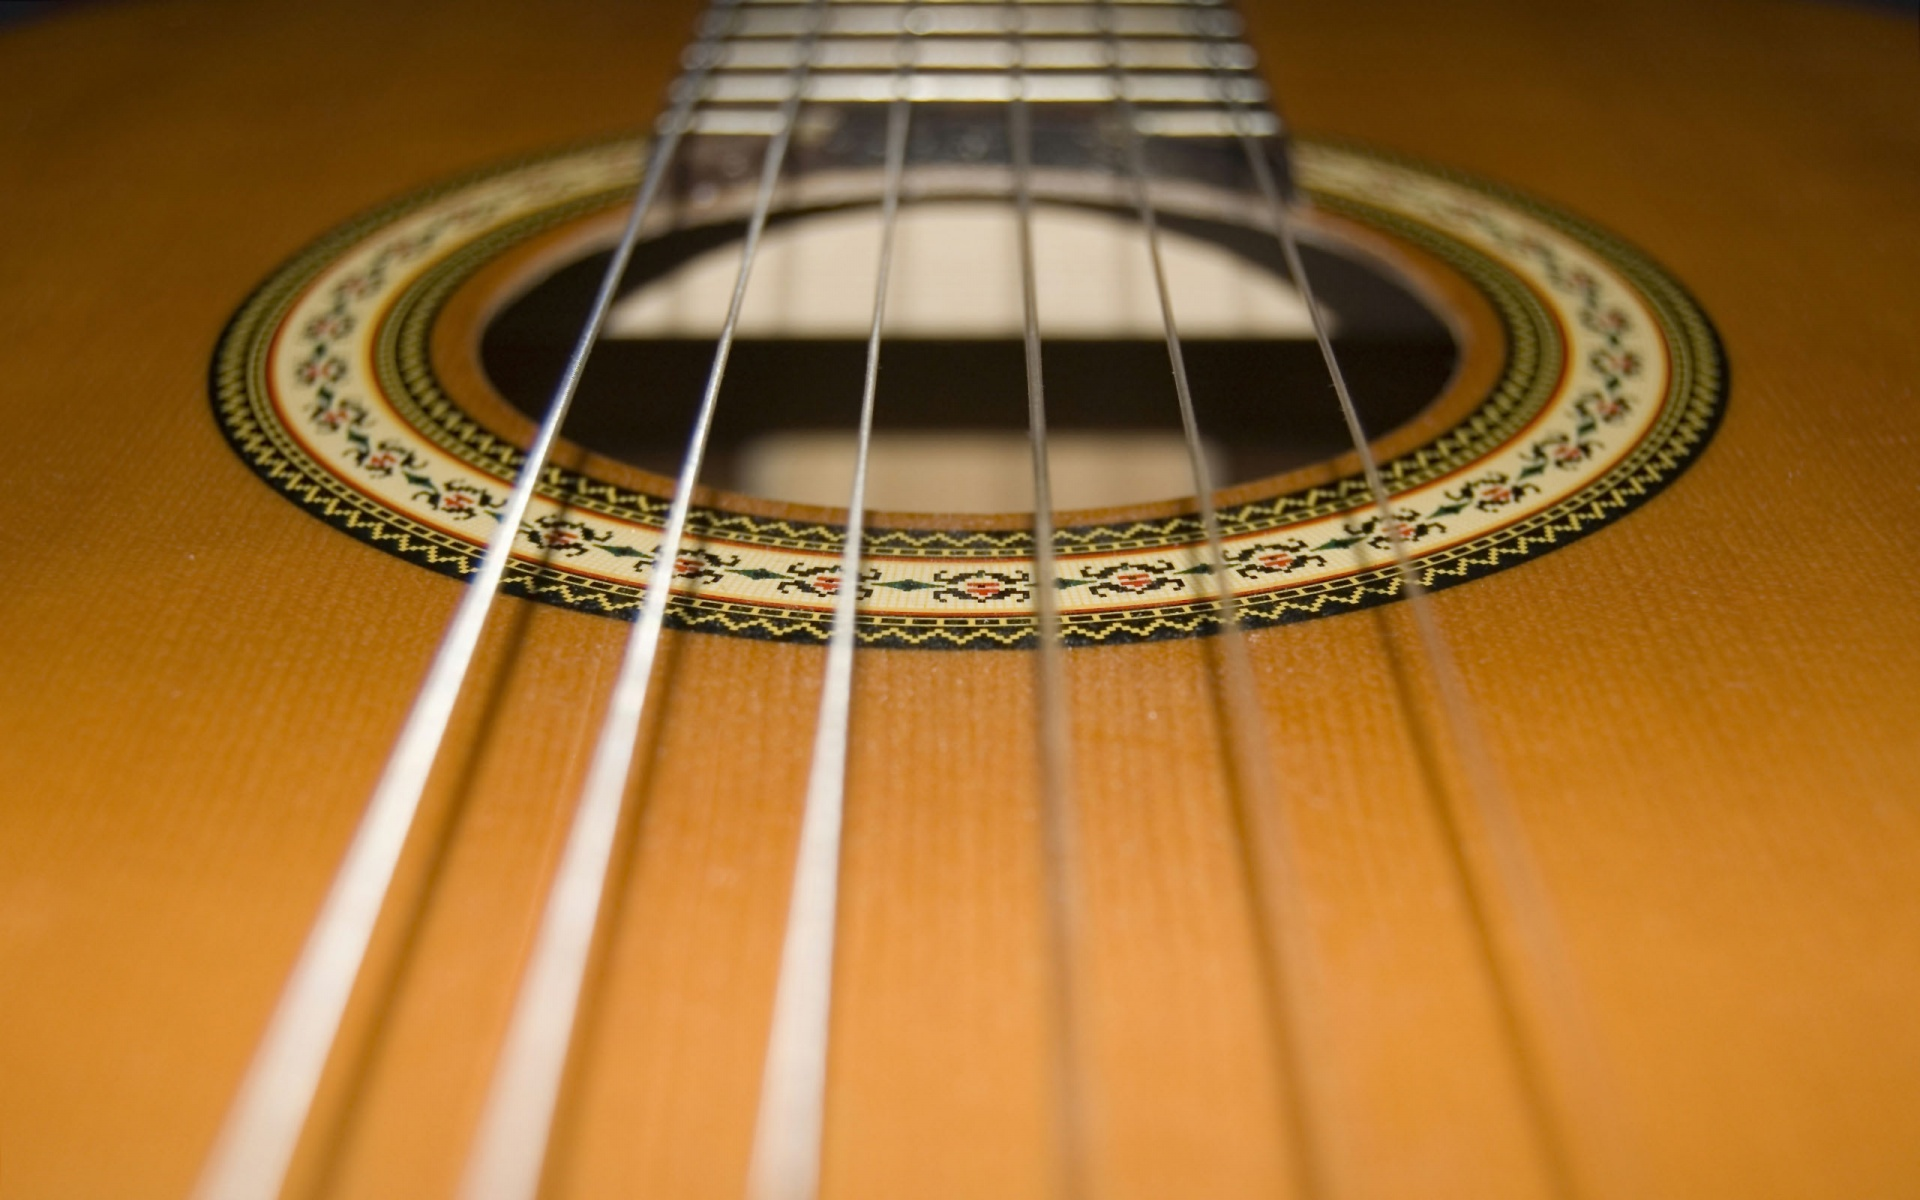 guitar strings   Steve Clayton Official Blog